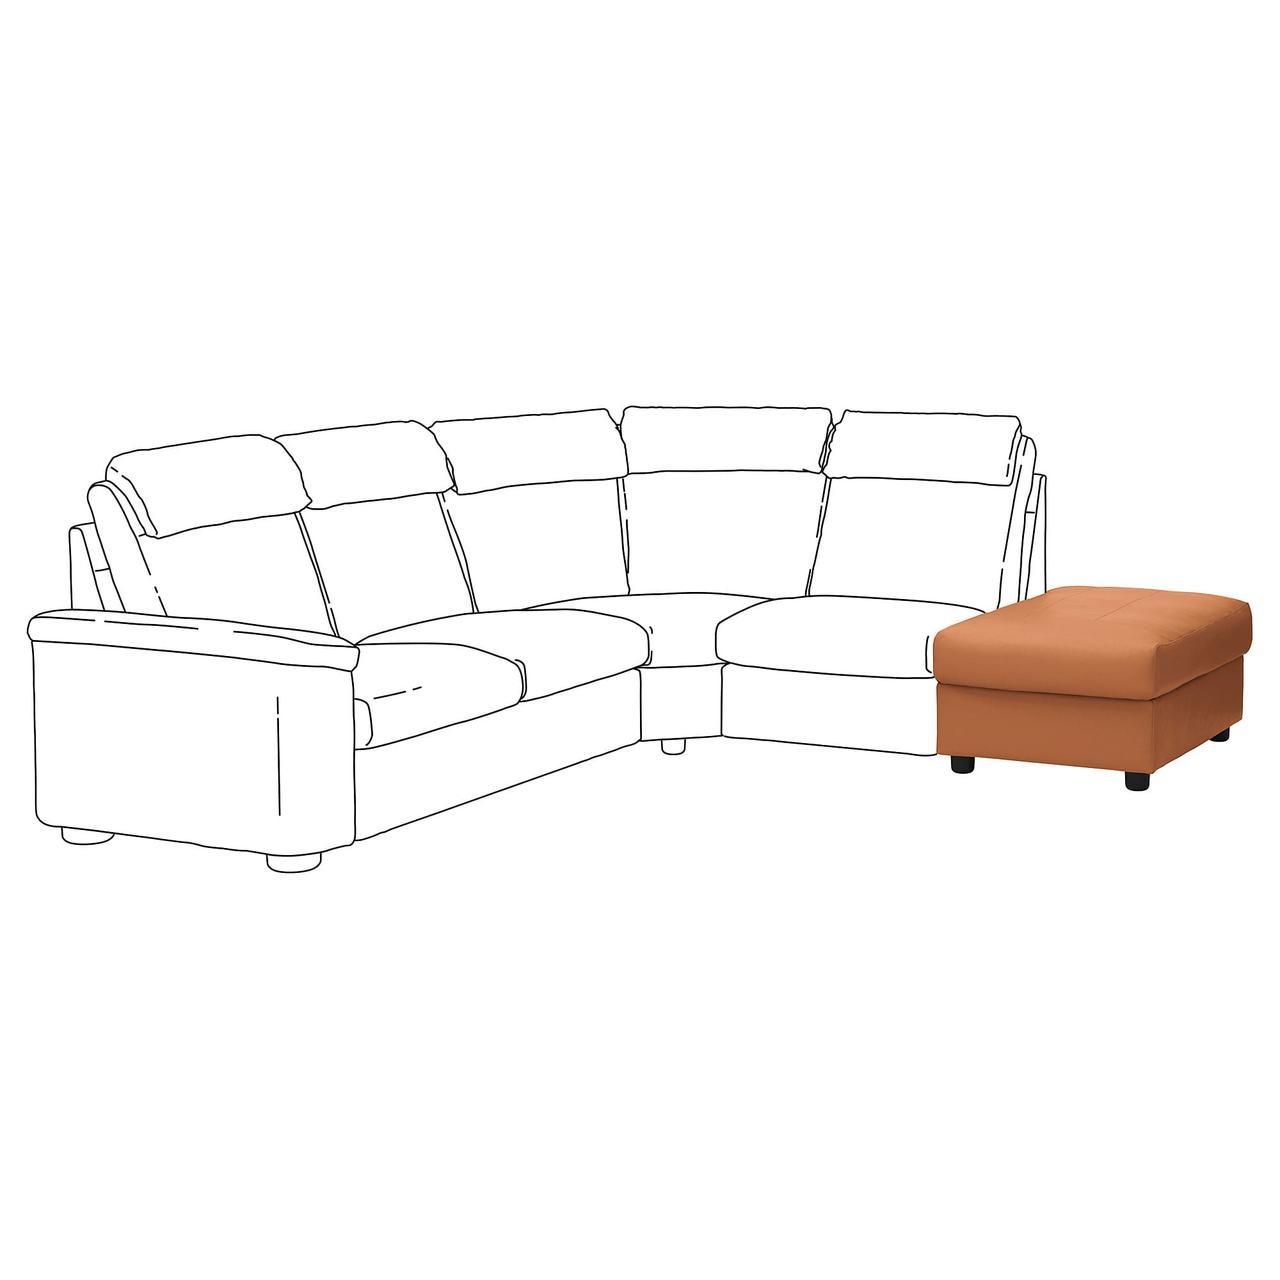 IKEA Модульная система дивана LIDHULT (204.132.12)